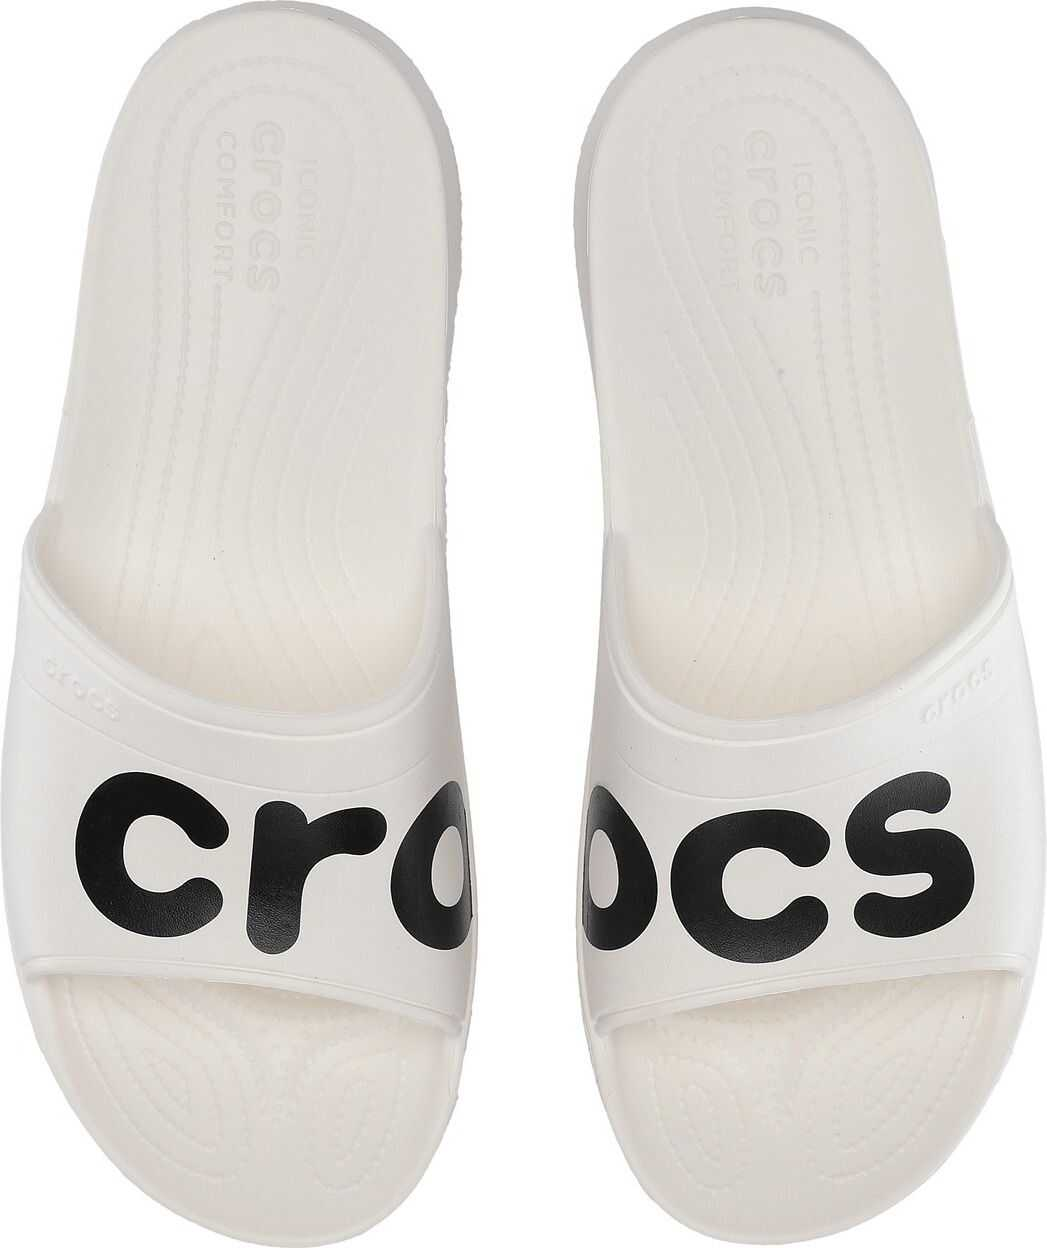 Crocs Classic Graphic Slide White/Black